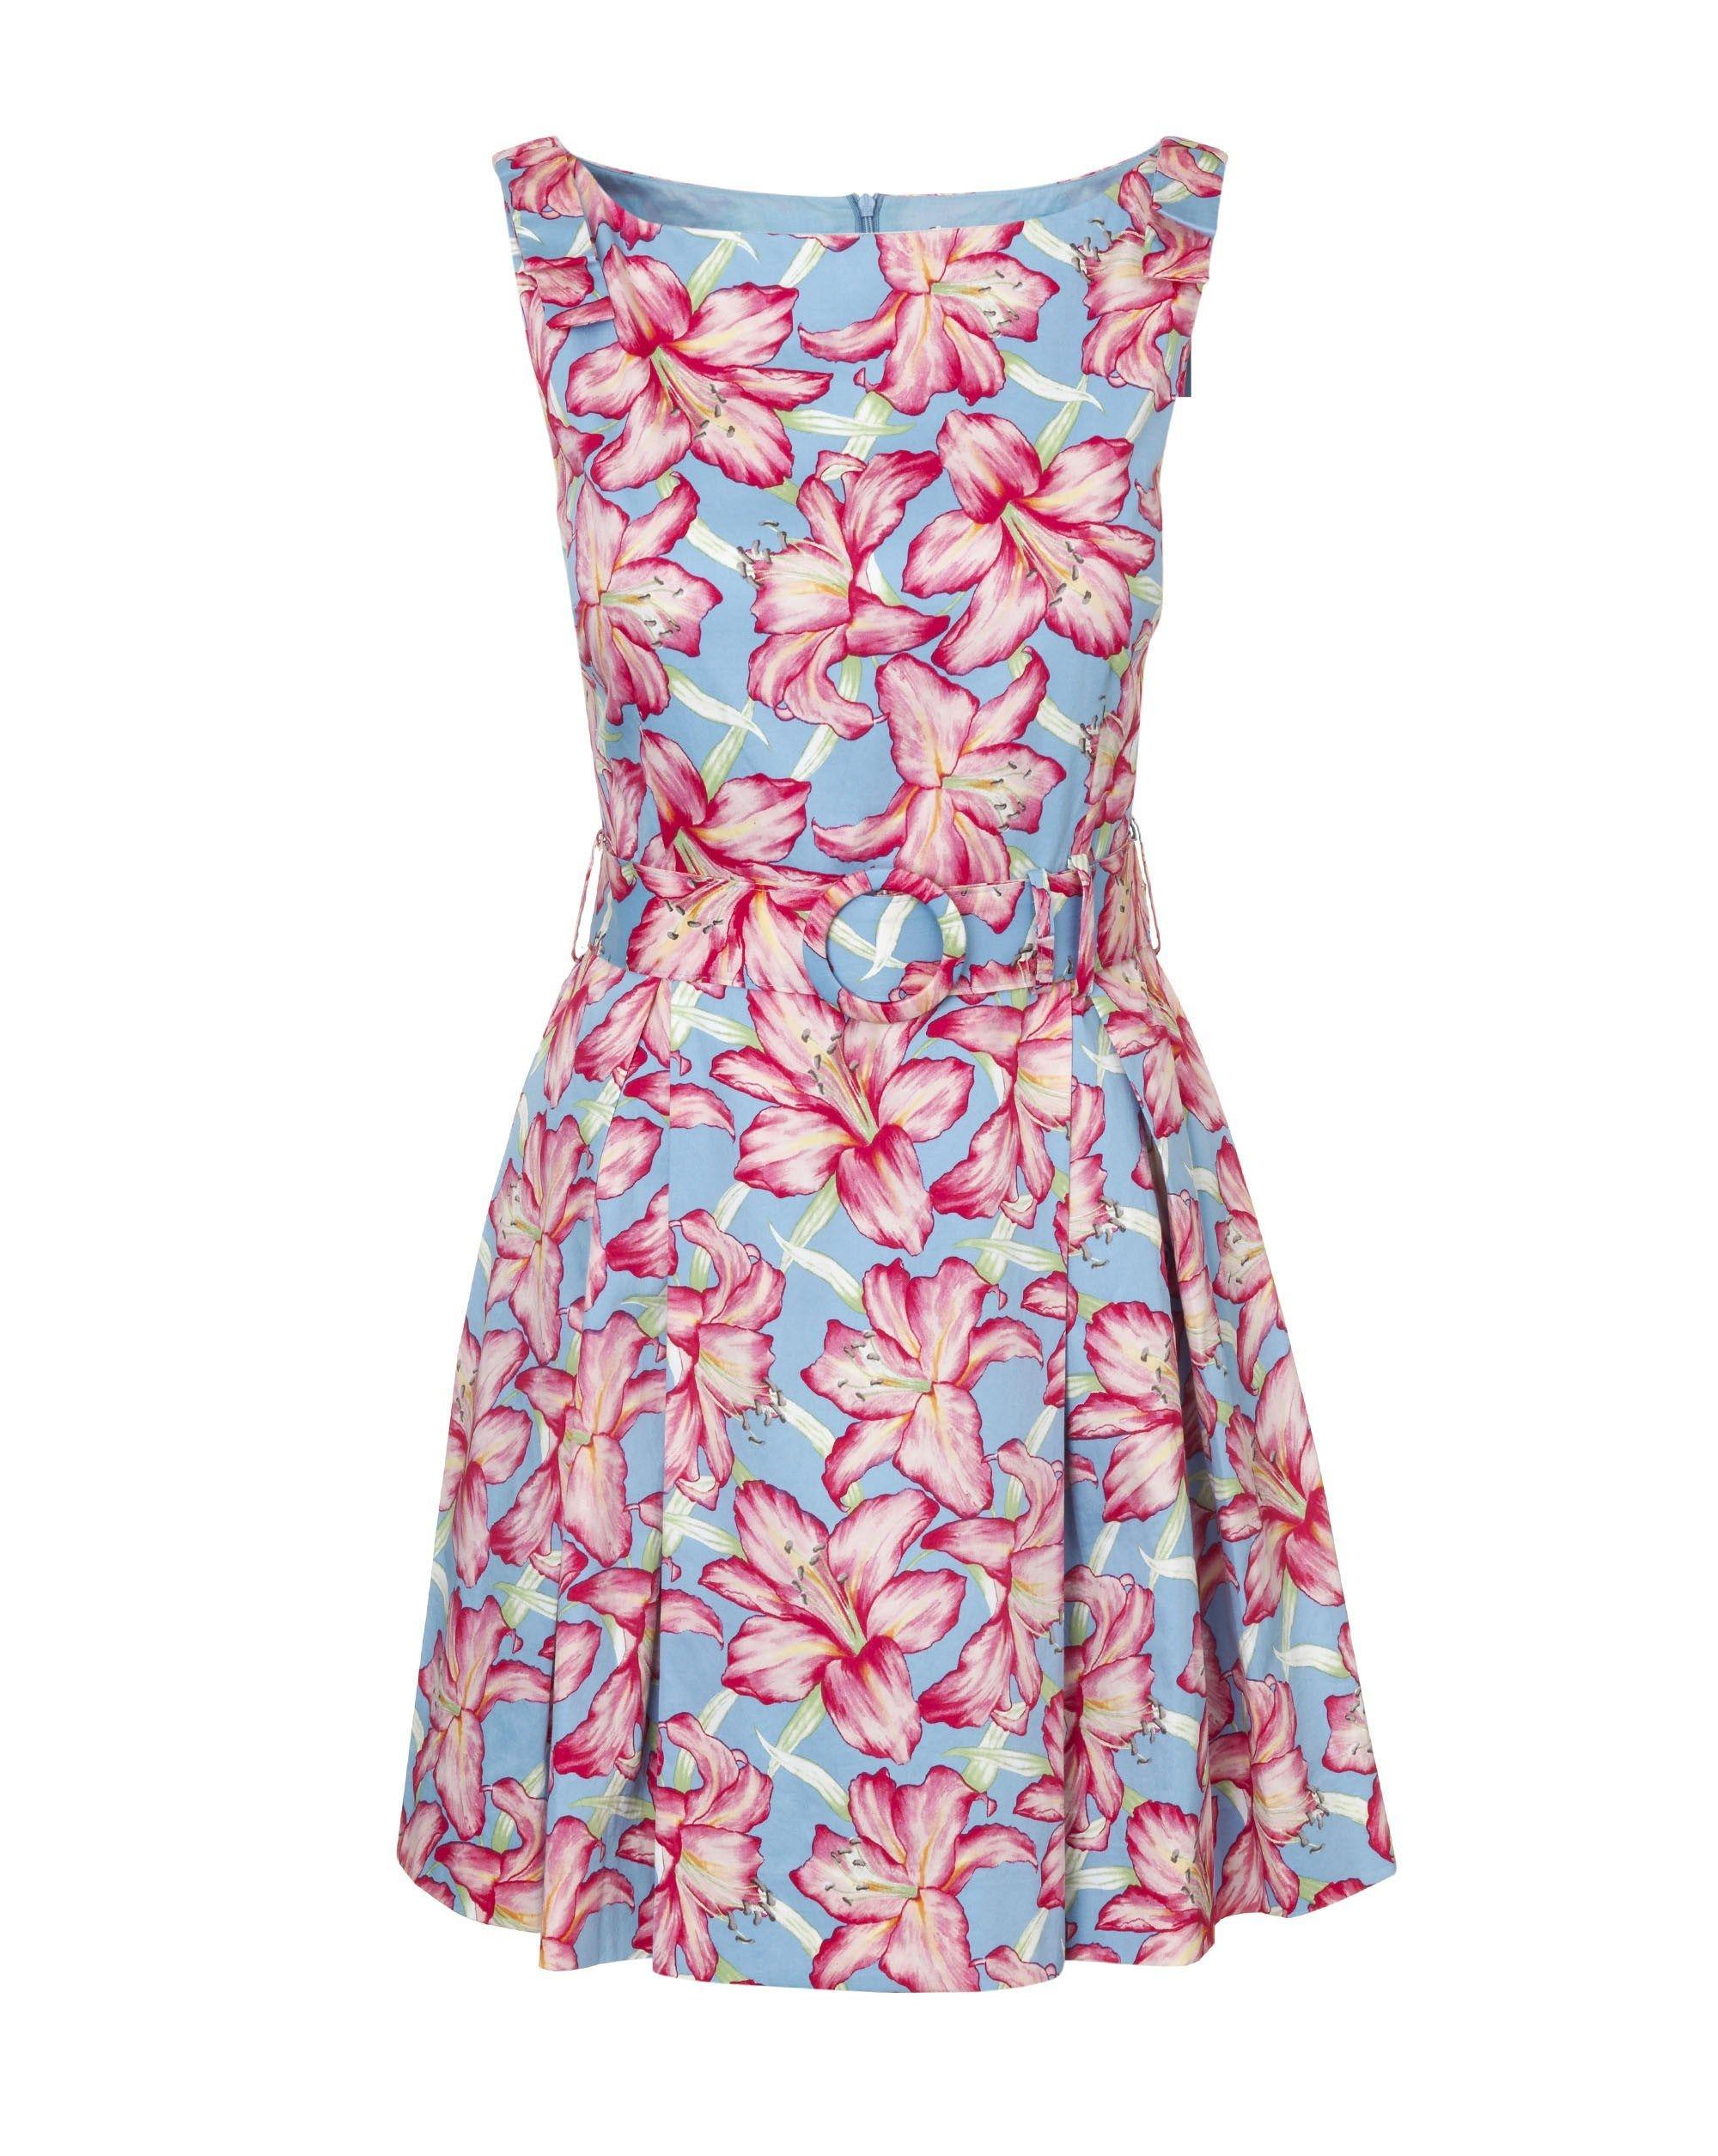 Make Do and Mend: Thrifty Summer Dress (Tutorial)